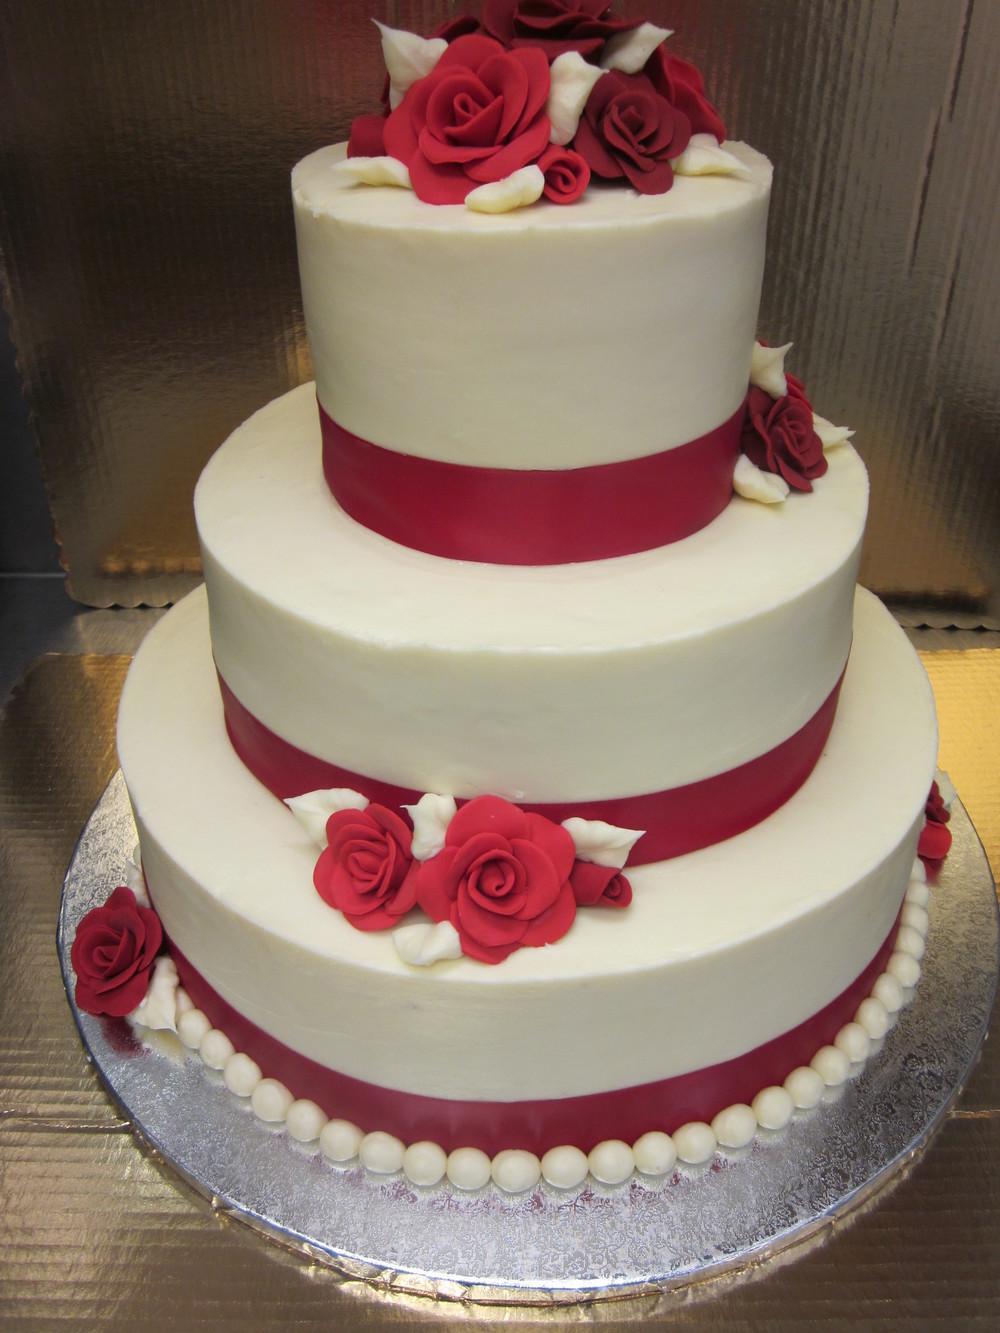 Wedding Cakes 610 626 7900 Sophisticakes